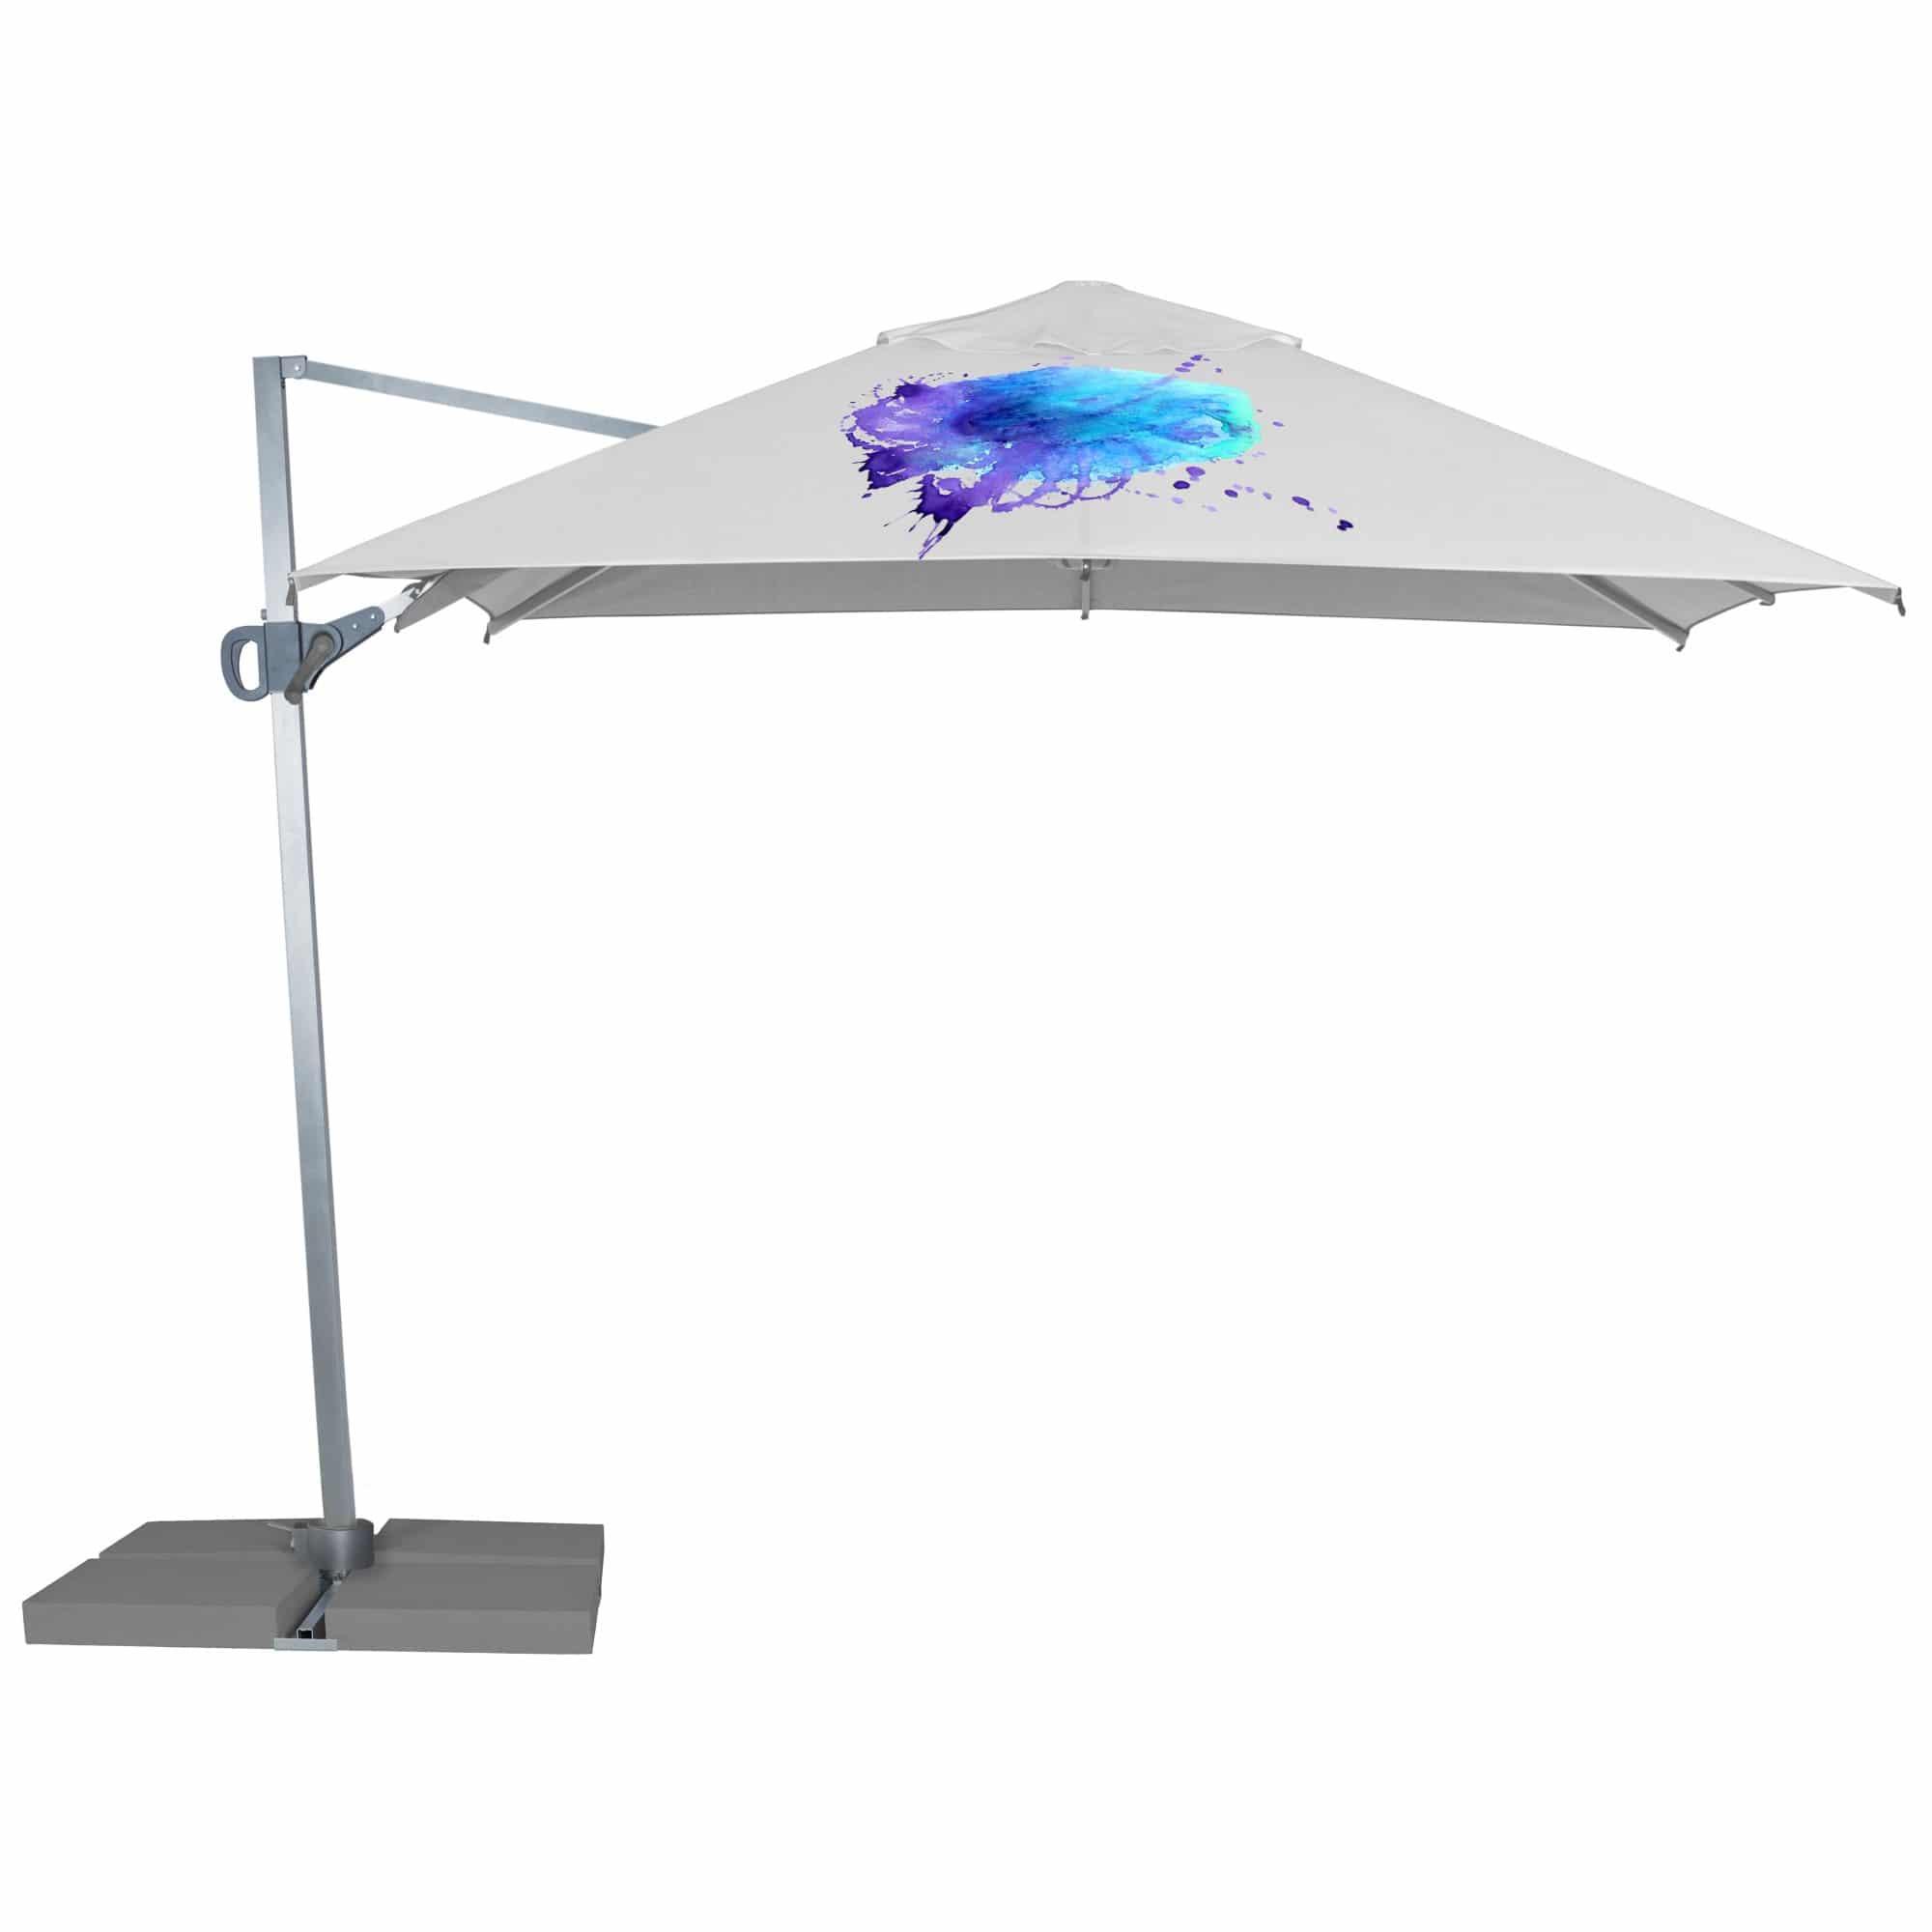 Branded Parasols 3m Cantilever